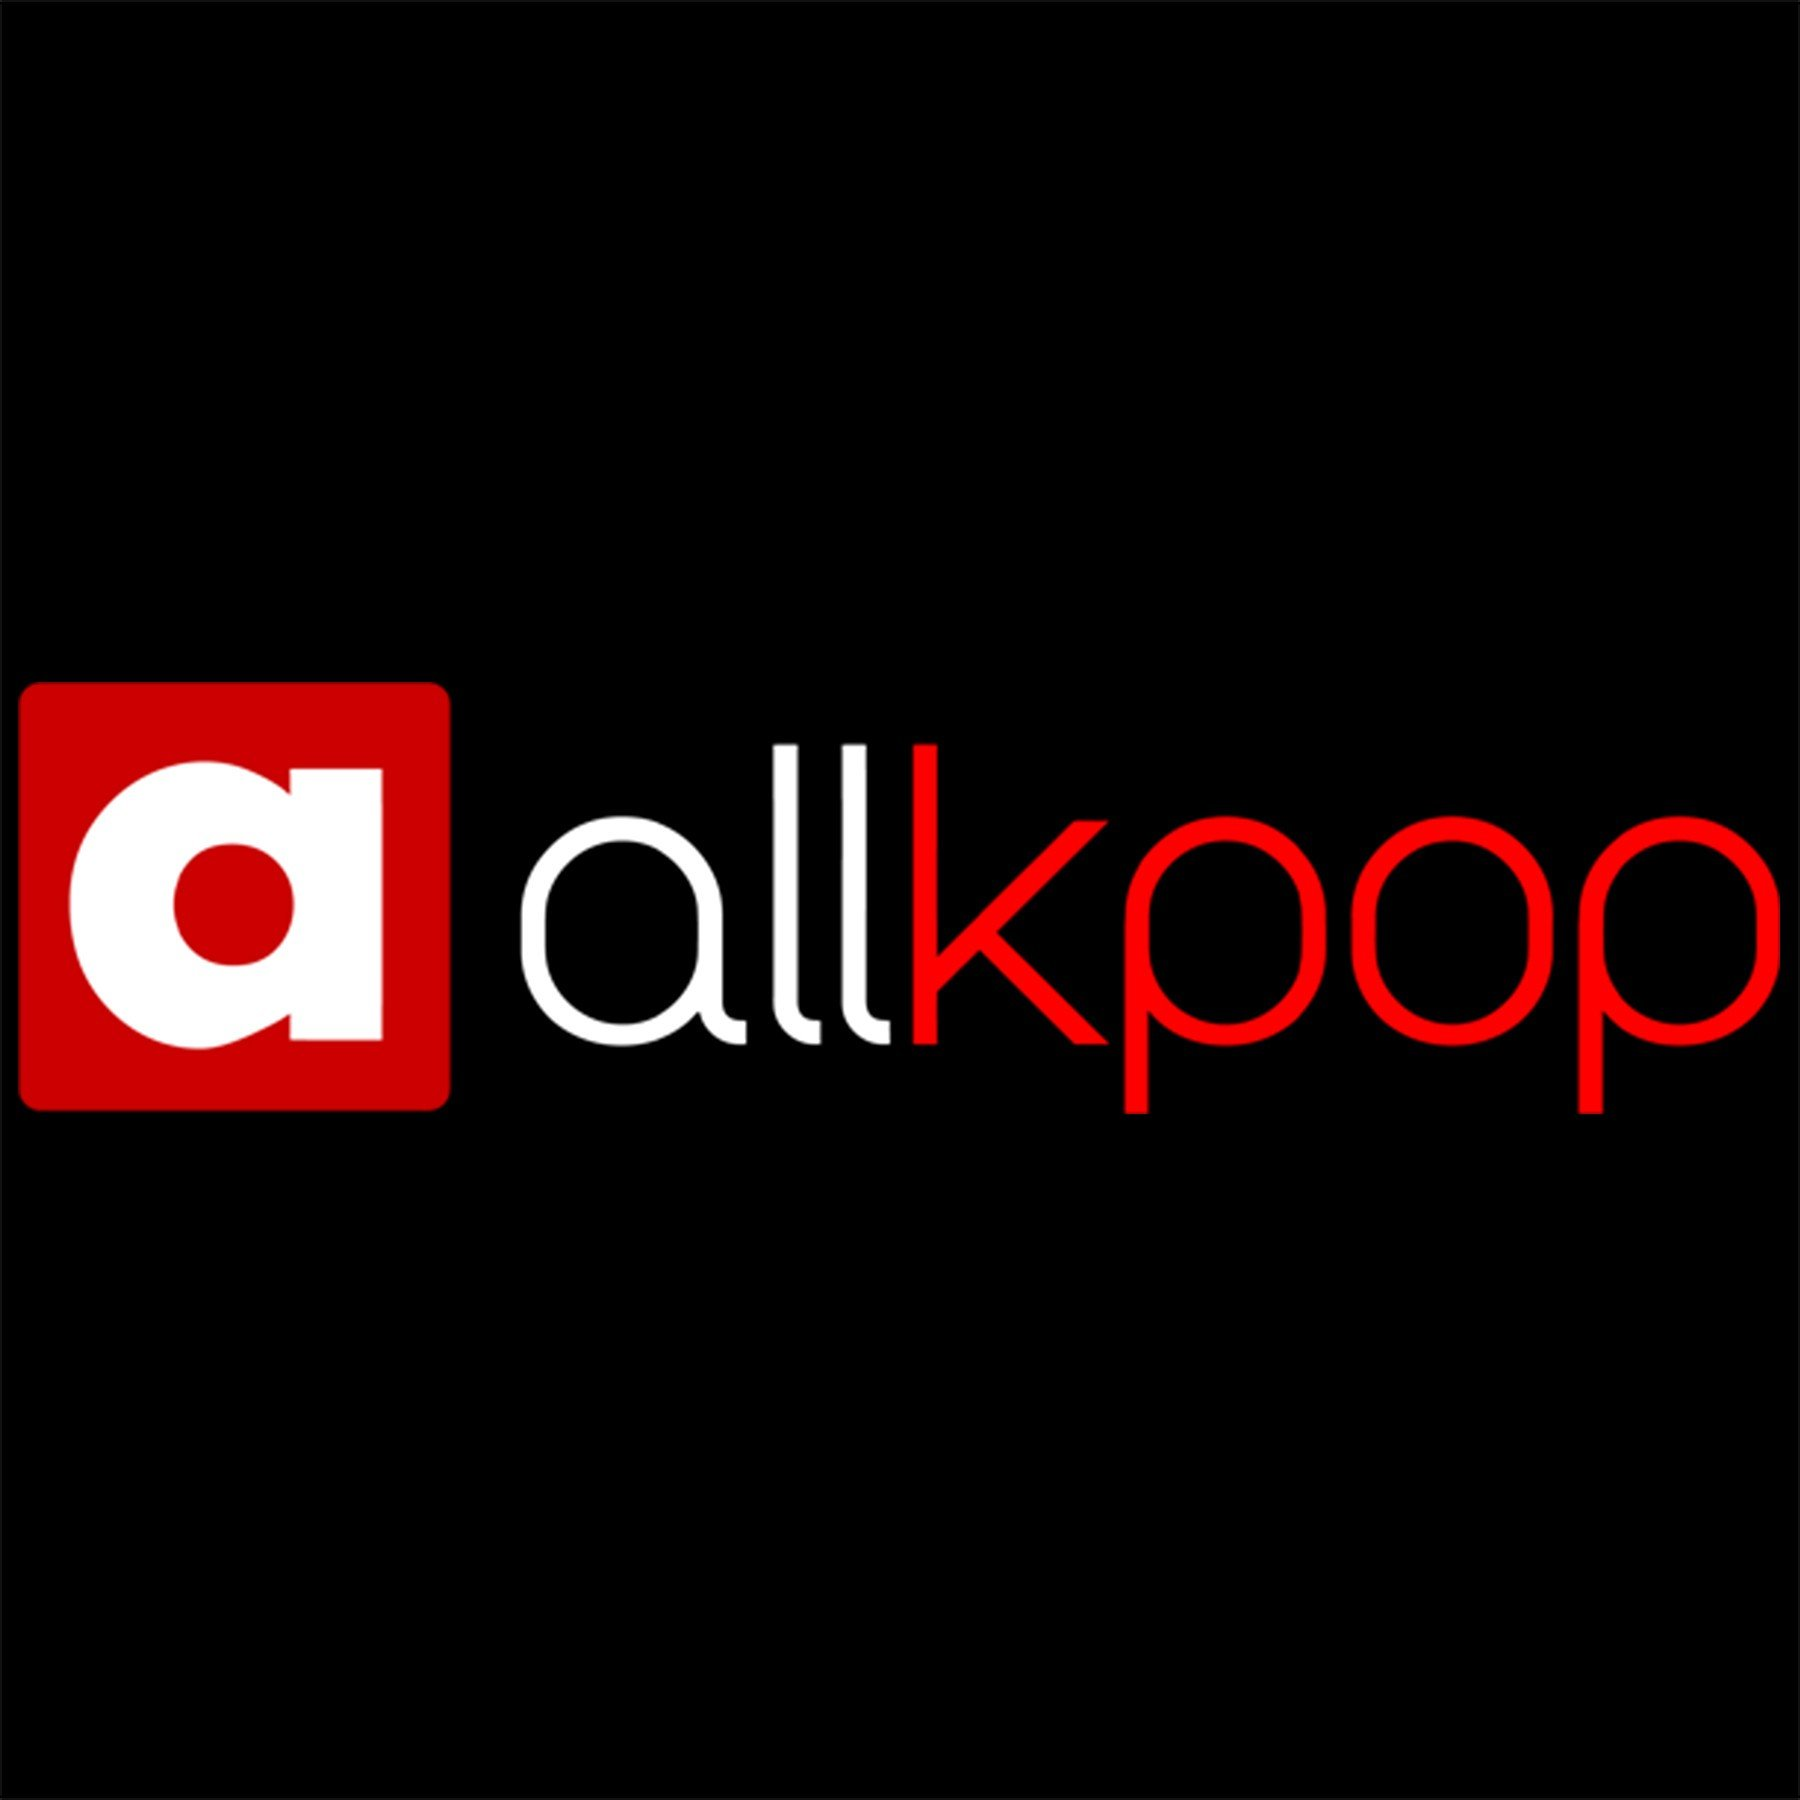 akp_logo_black_aa523fef-ad1e-4066-abfd-d07d6b1cbe39.jpg